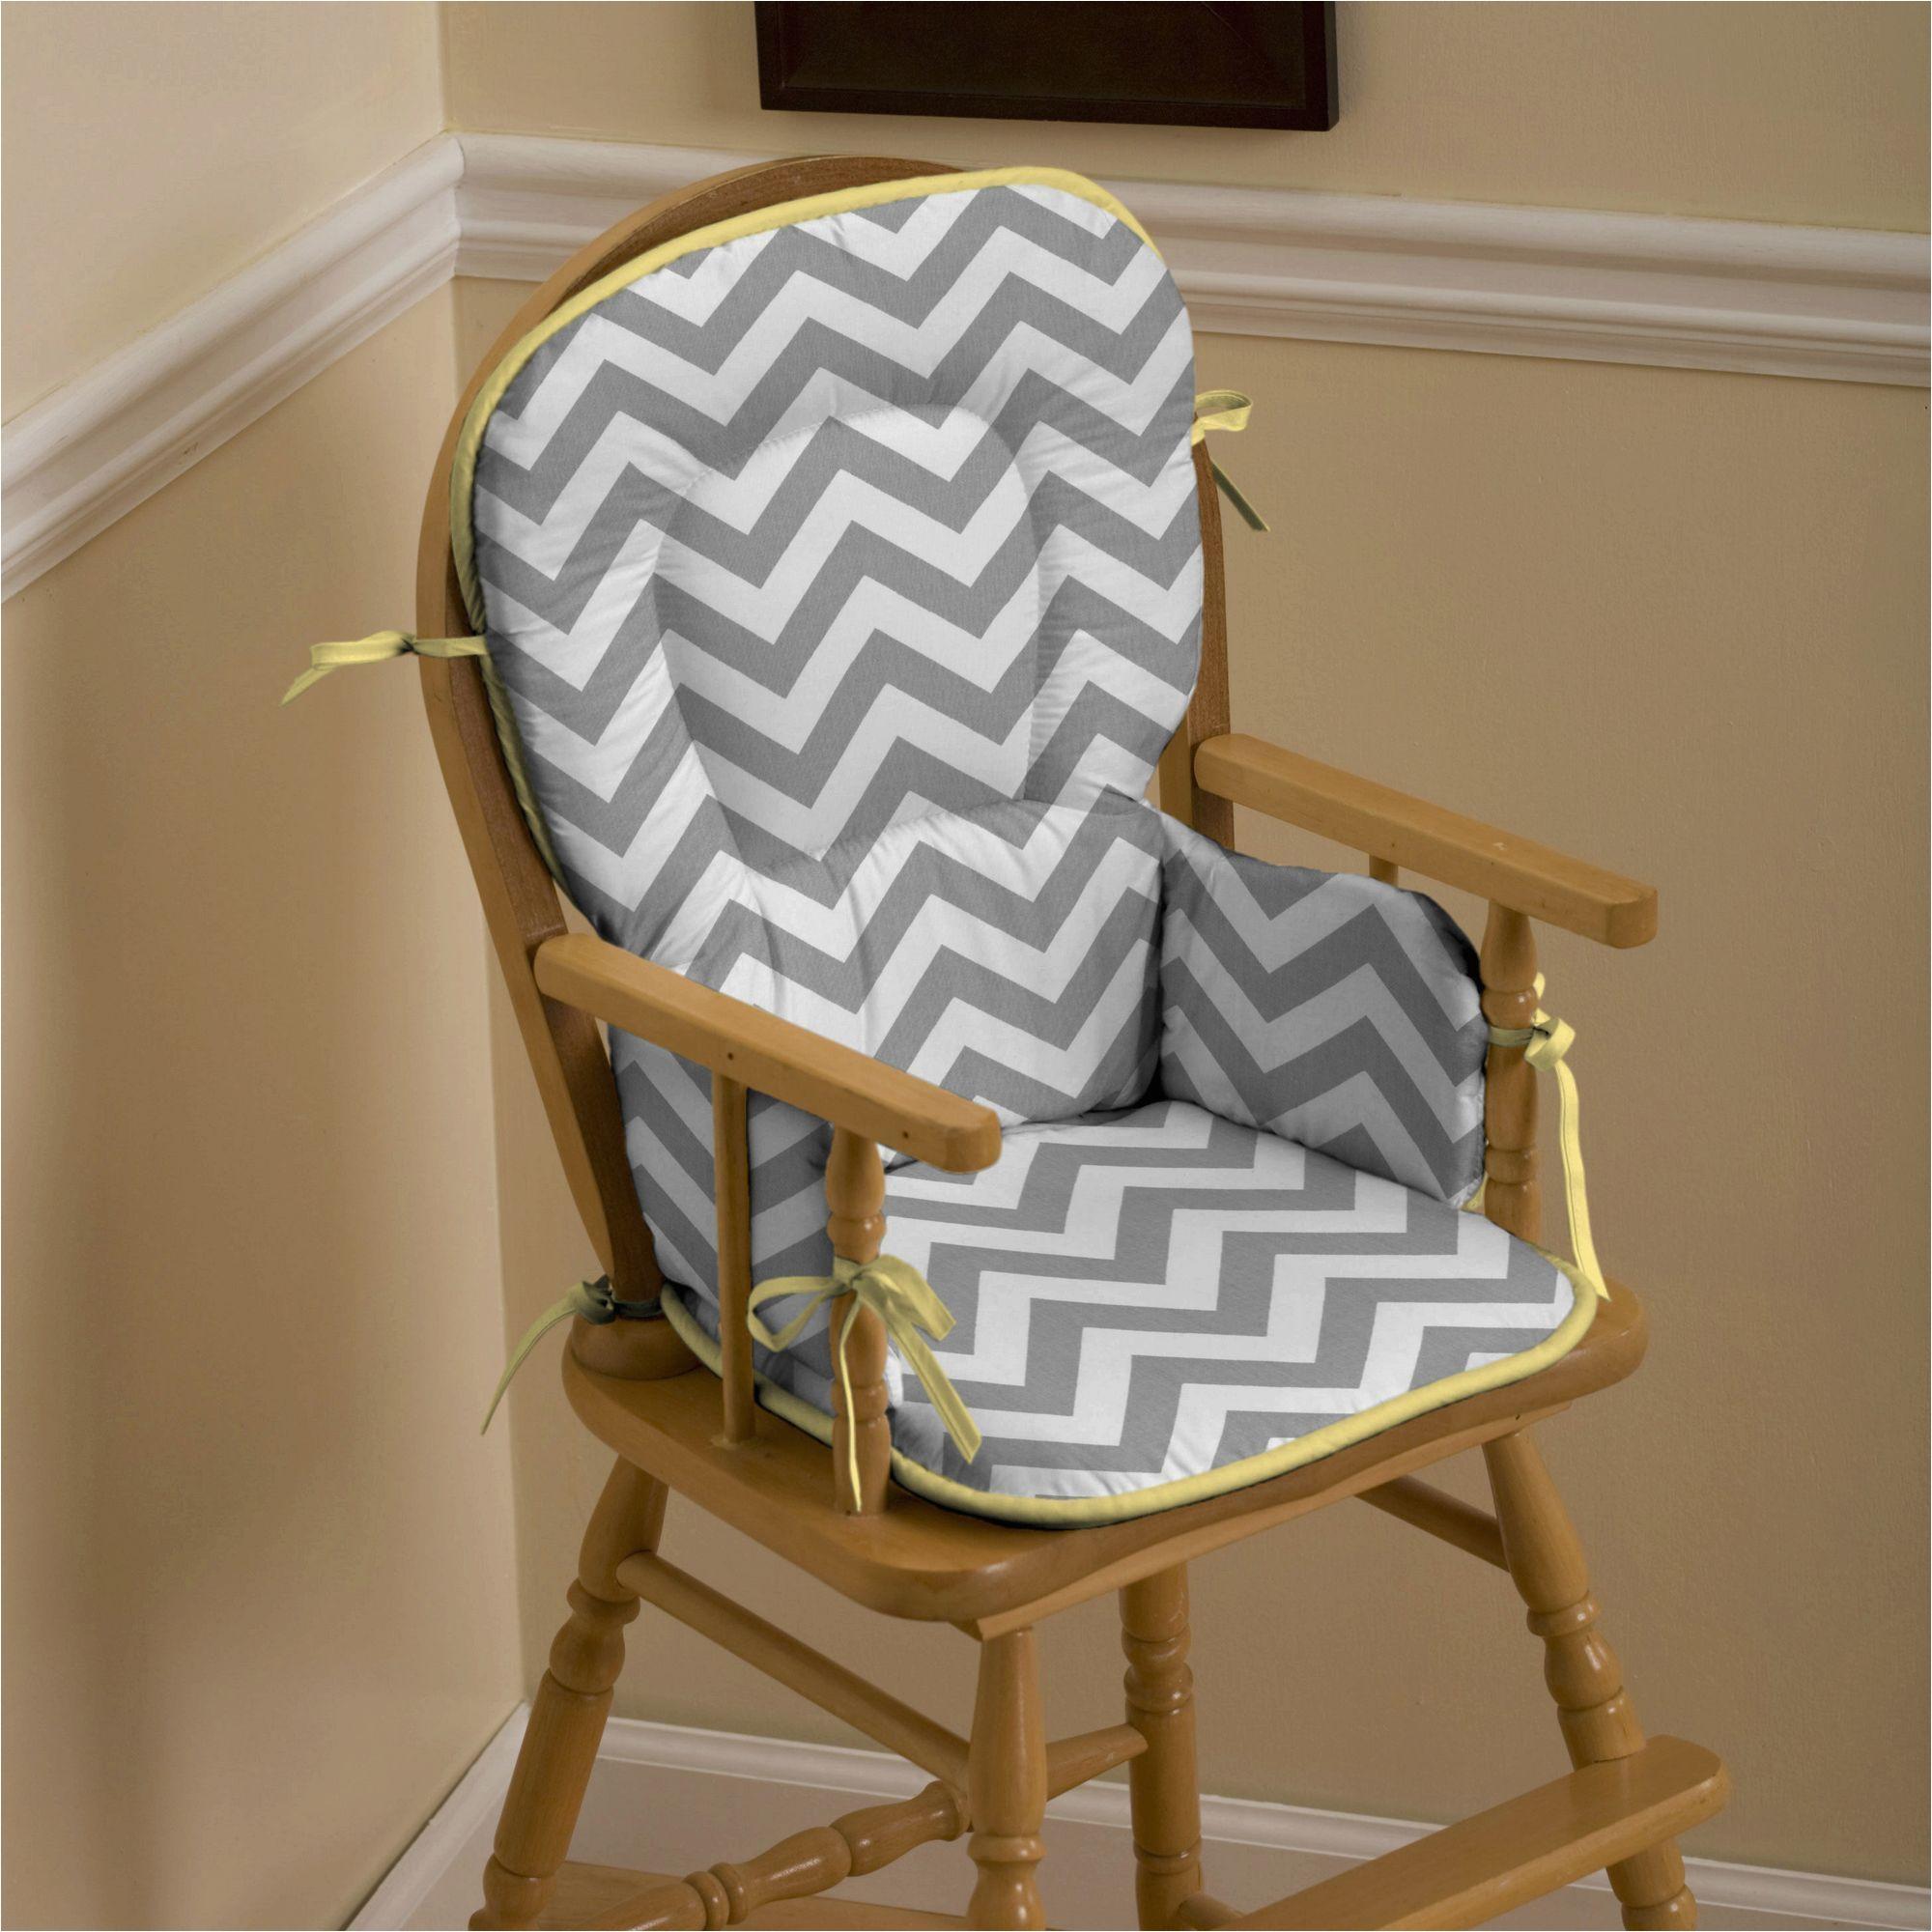 full size of chaircustom chair cushions gray and yellow zig zag high chair pad